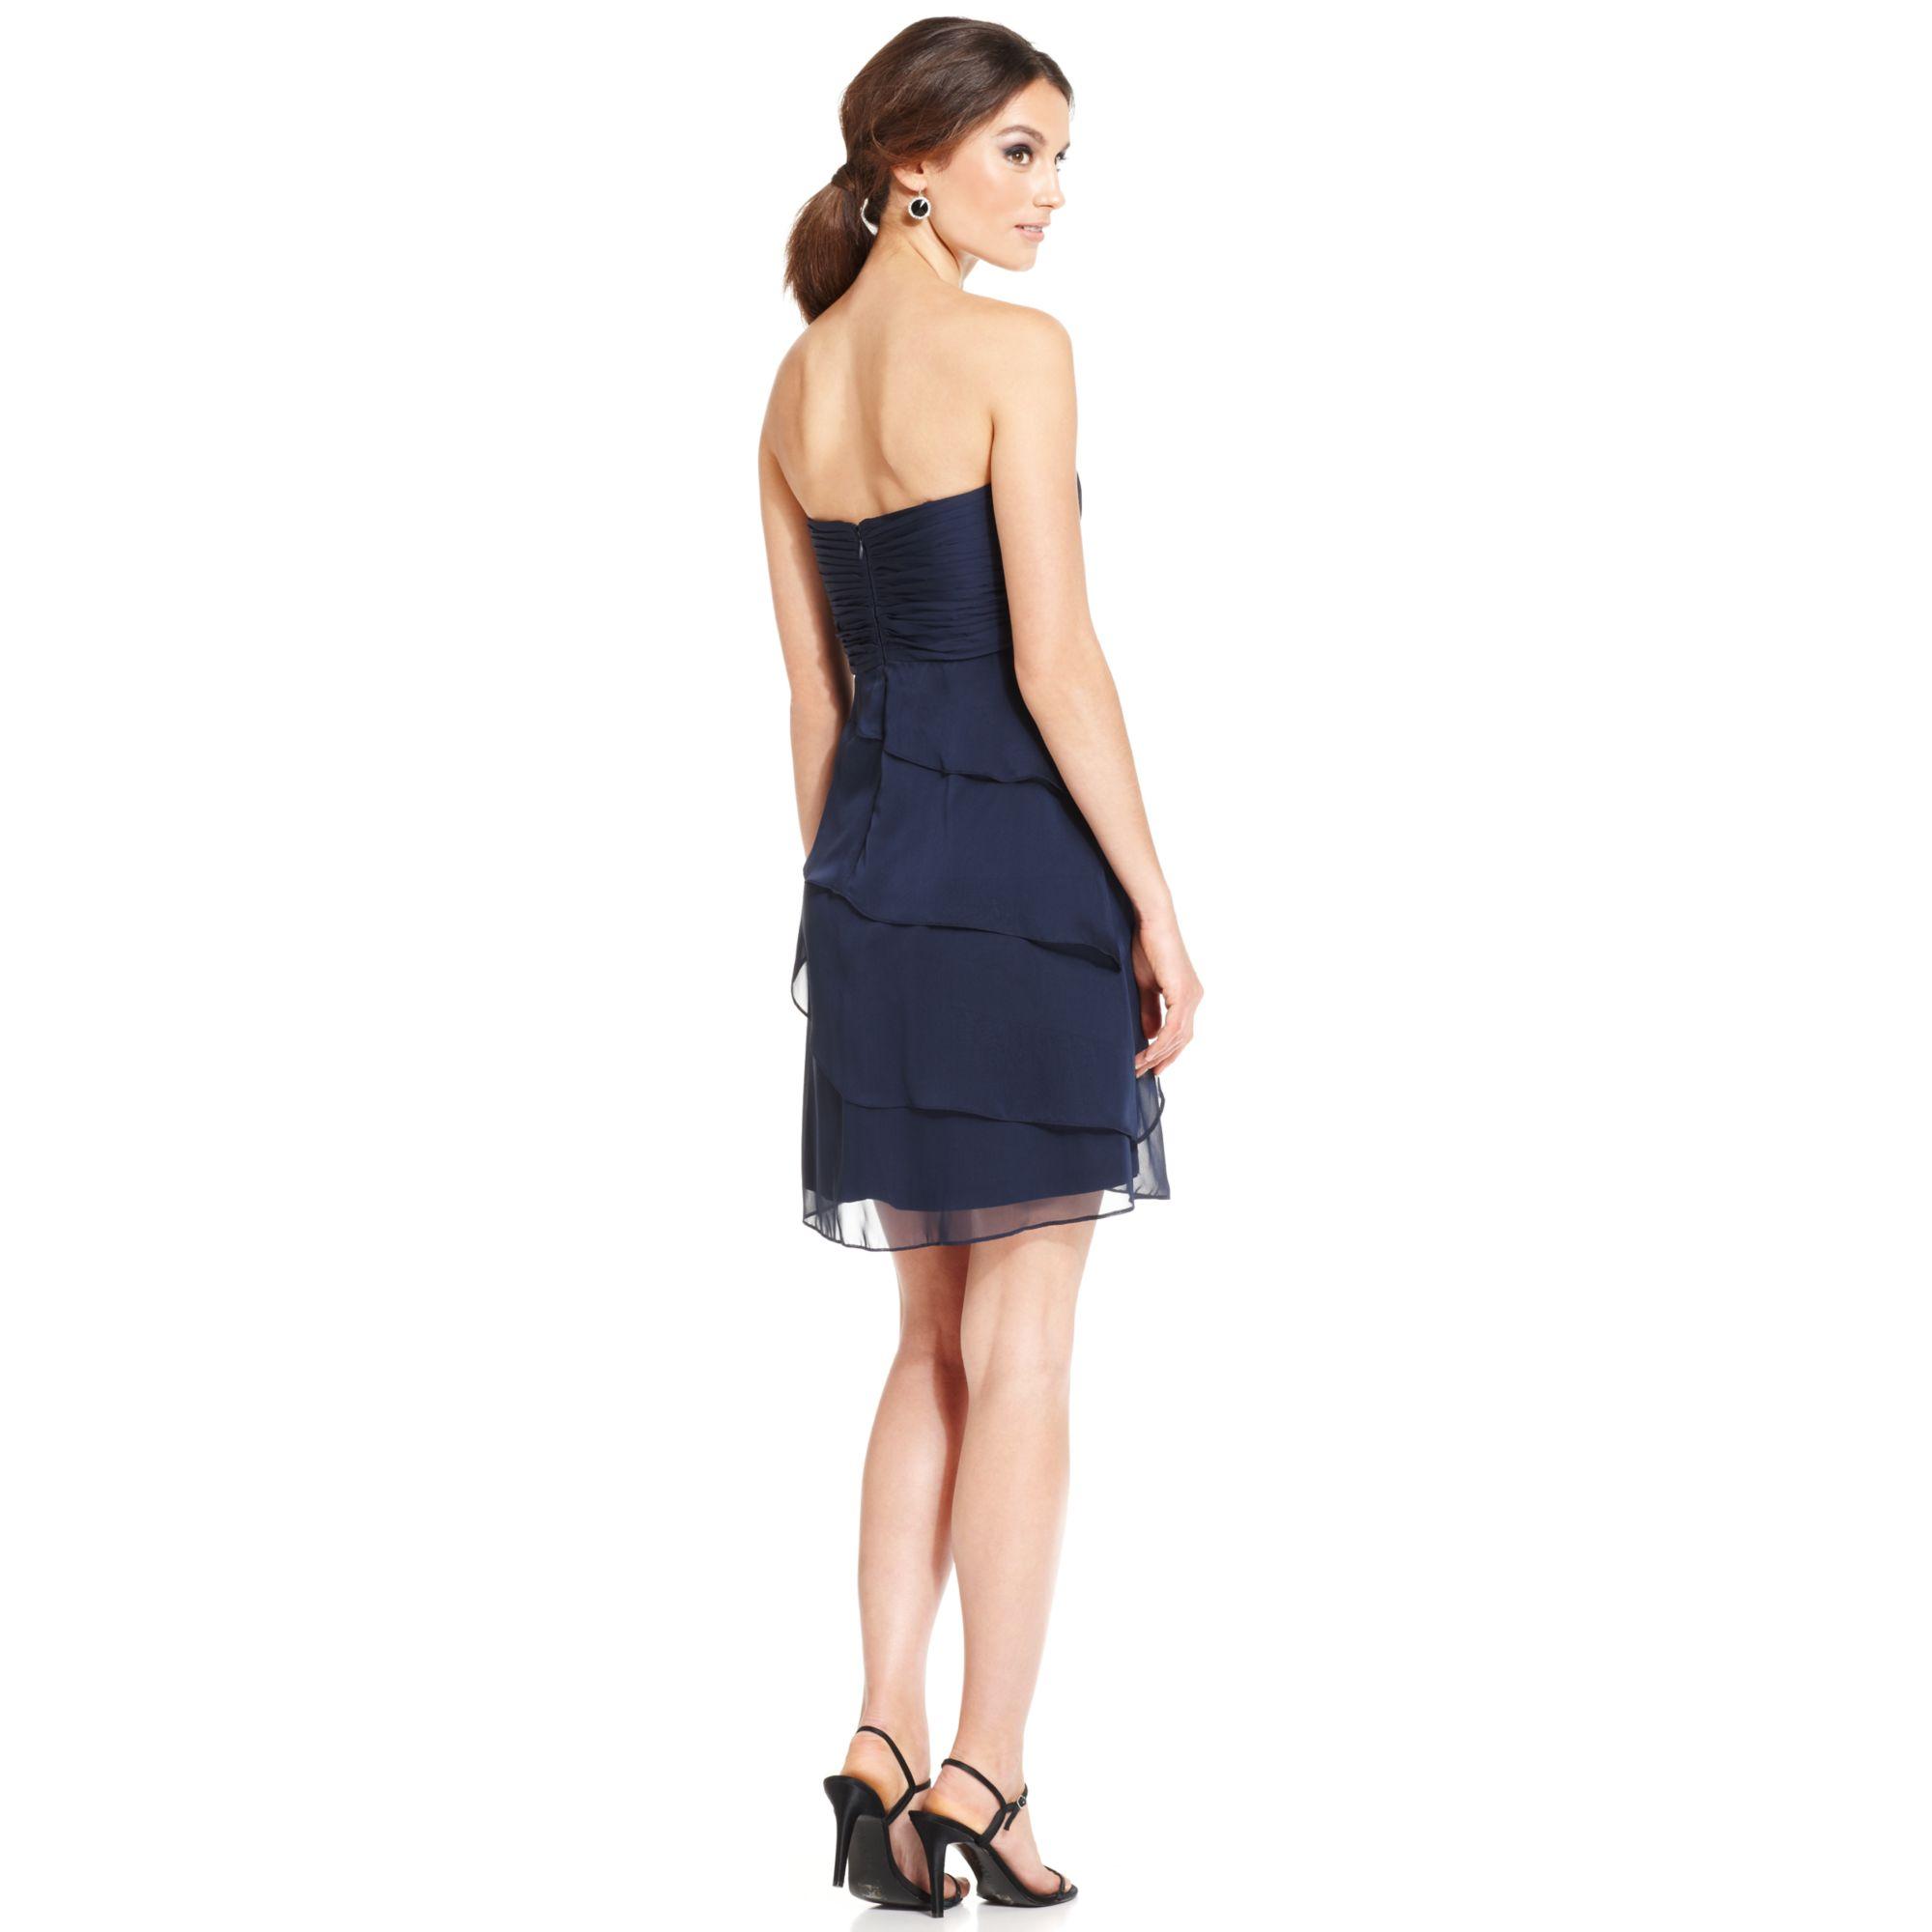 066e2e95ed Strapless Dresses and Shawls – Fashion dresses